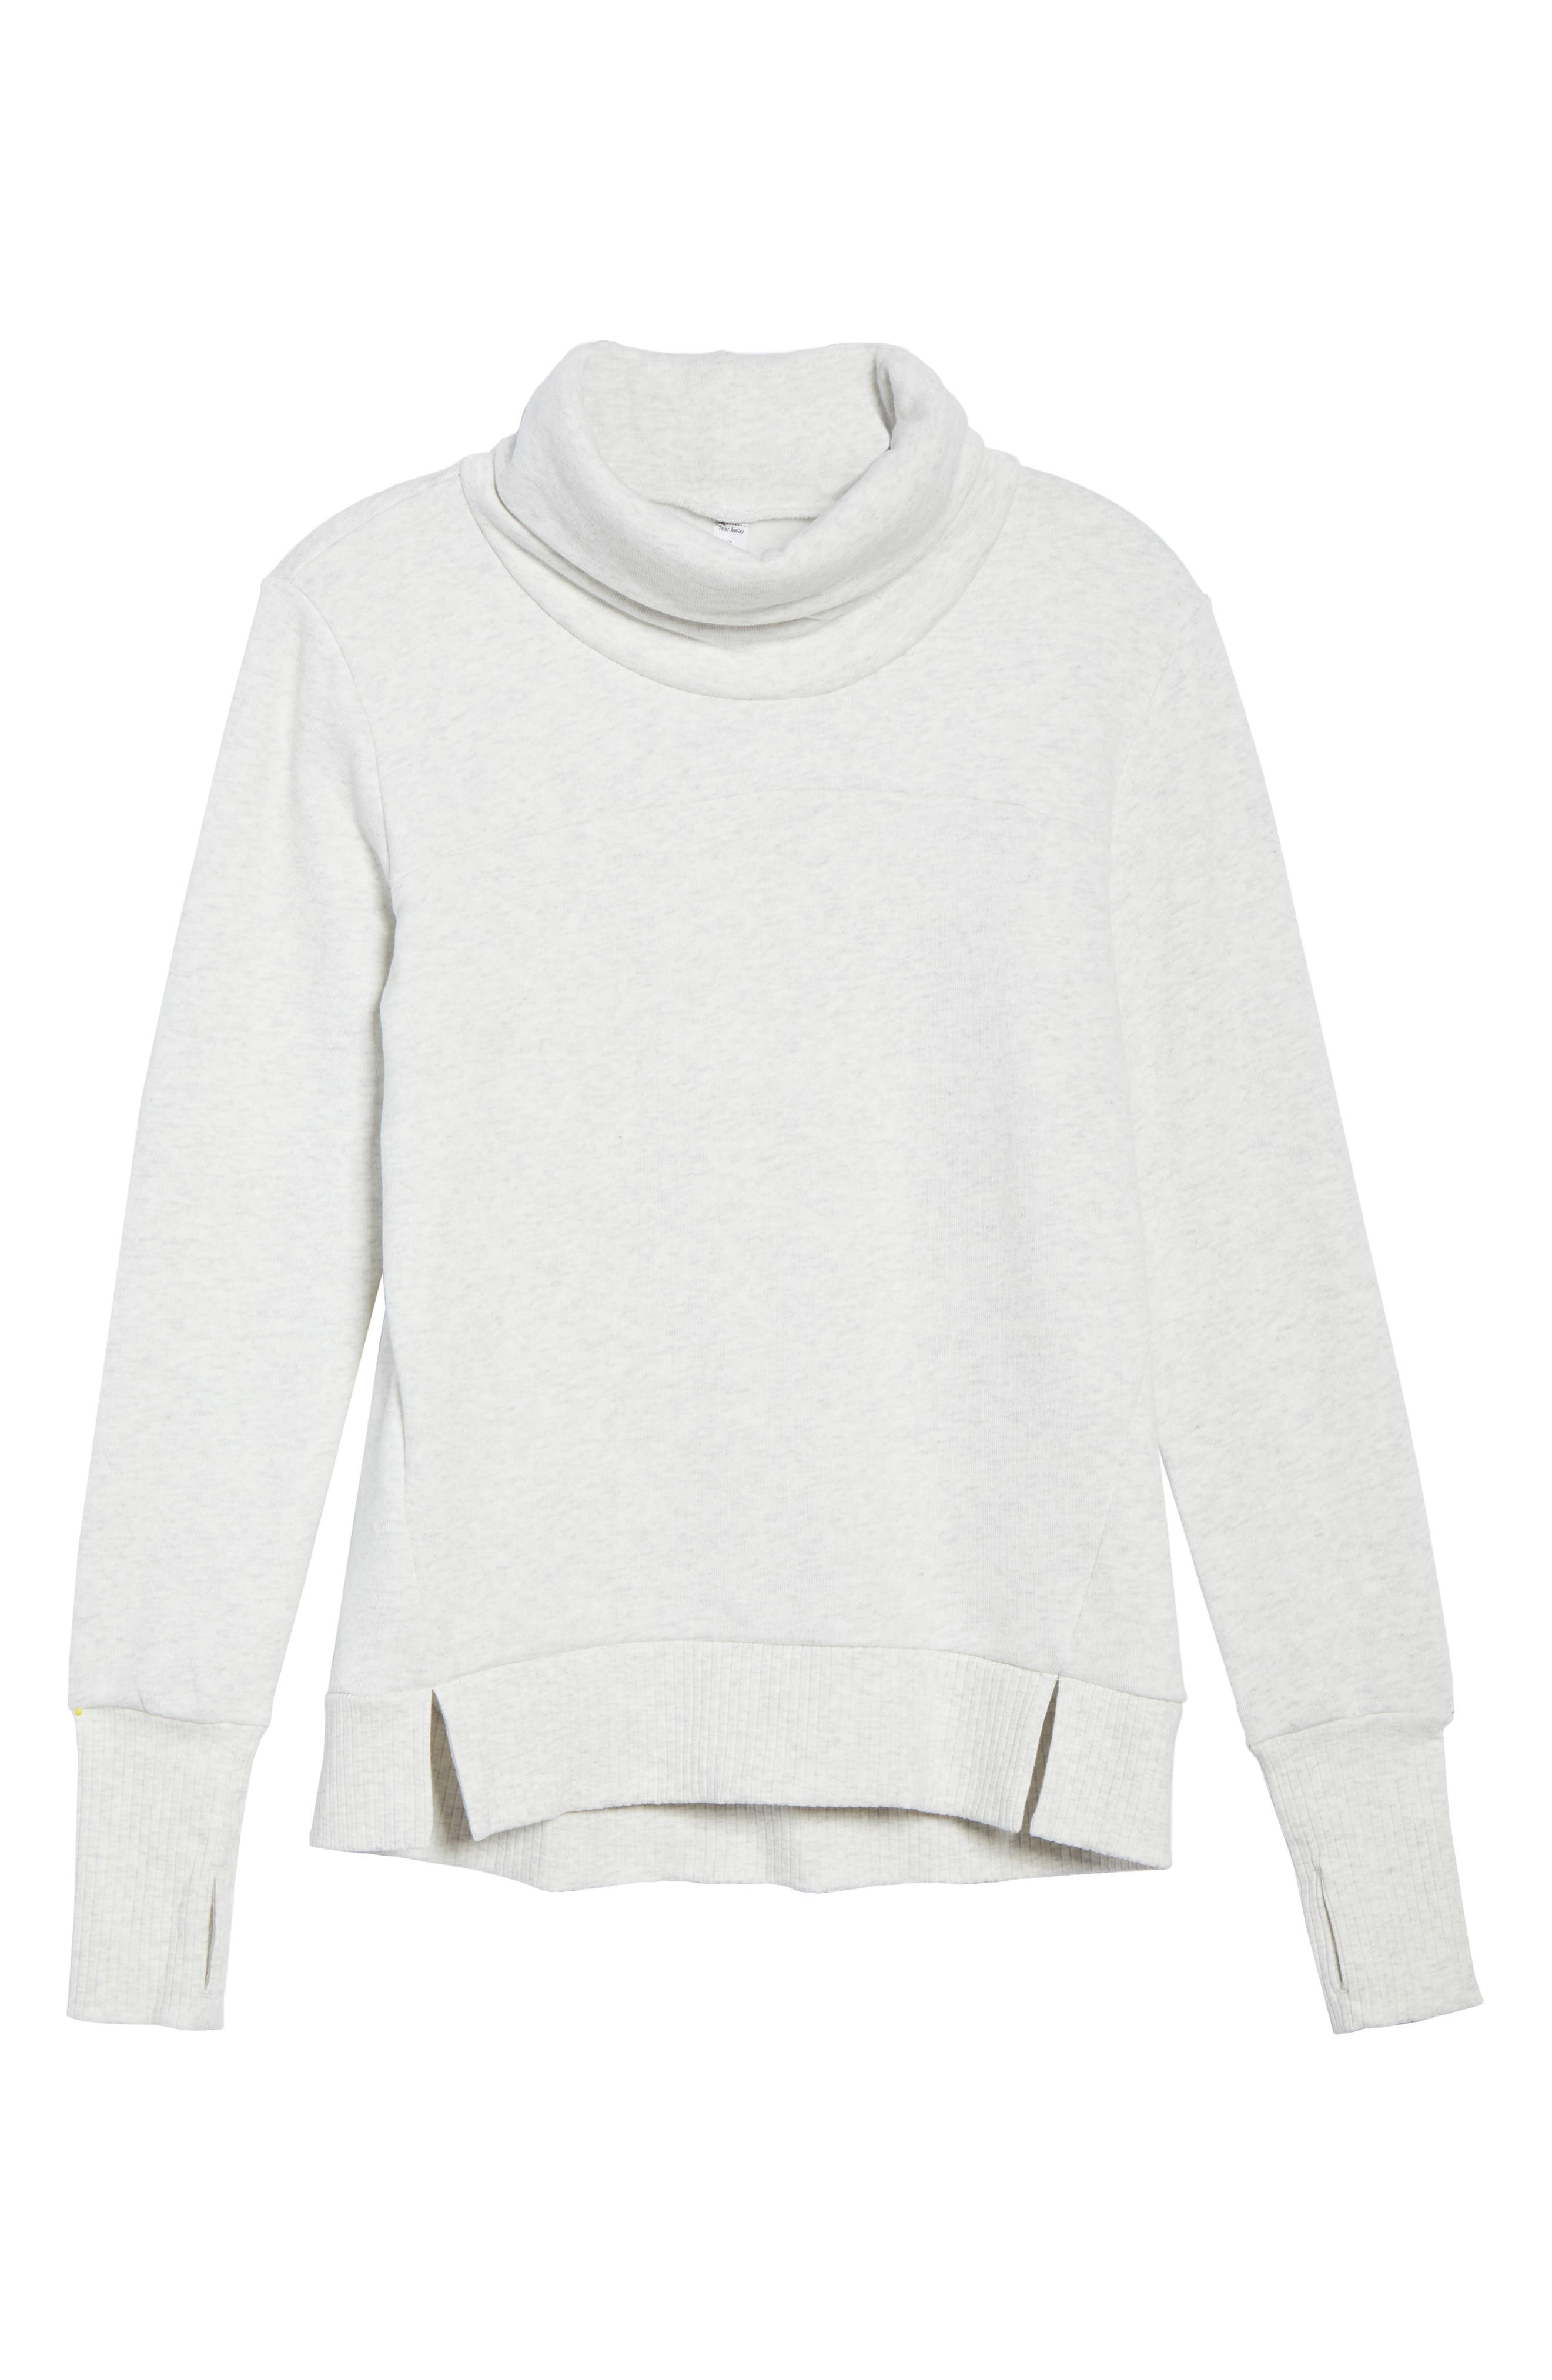 'Haze' Funnel Neck Sweatshirt,                             Alternate thumbnail 7, color,                             WHITE HEATHER